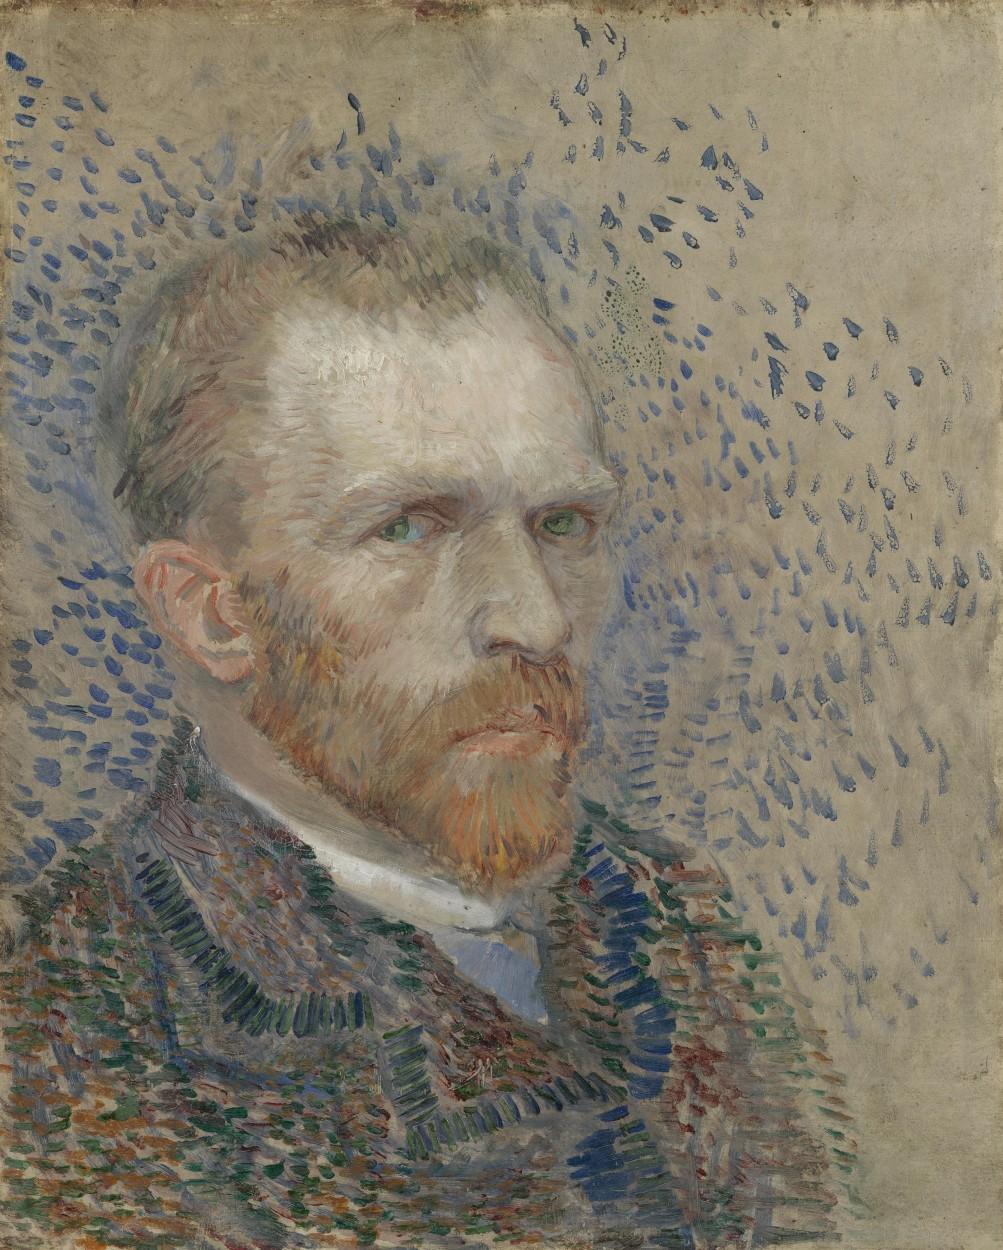 Self-portrait by Vincent van Gogh via DailyArt app, your daily dose of art getdailyart.com